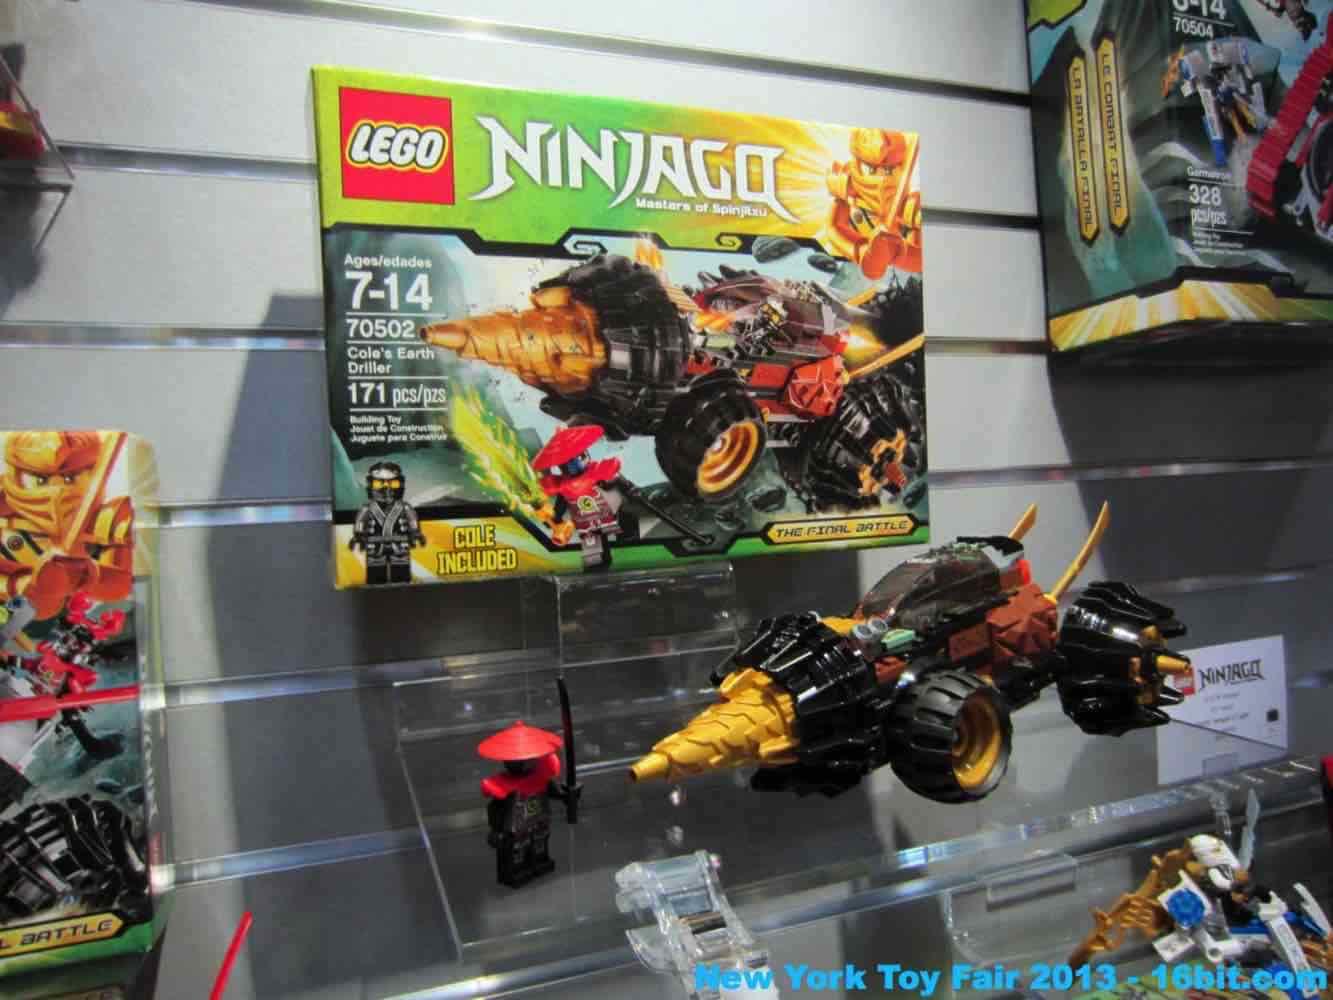 www.lego ninjago.com